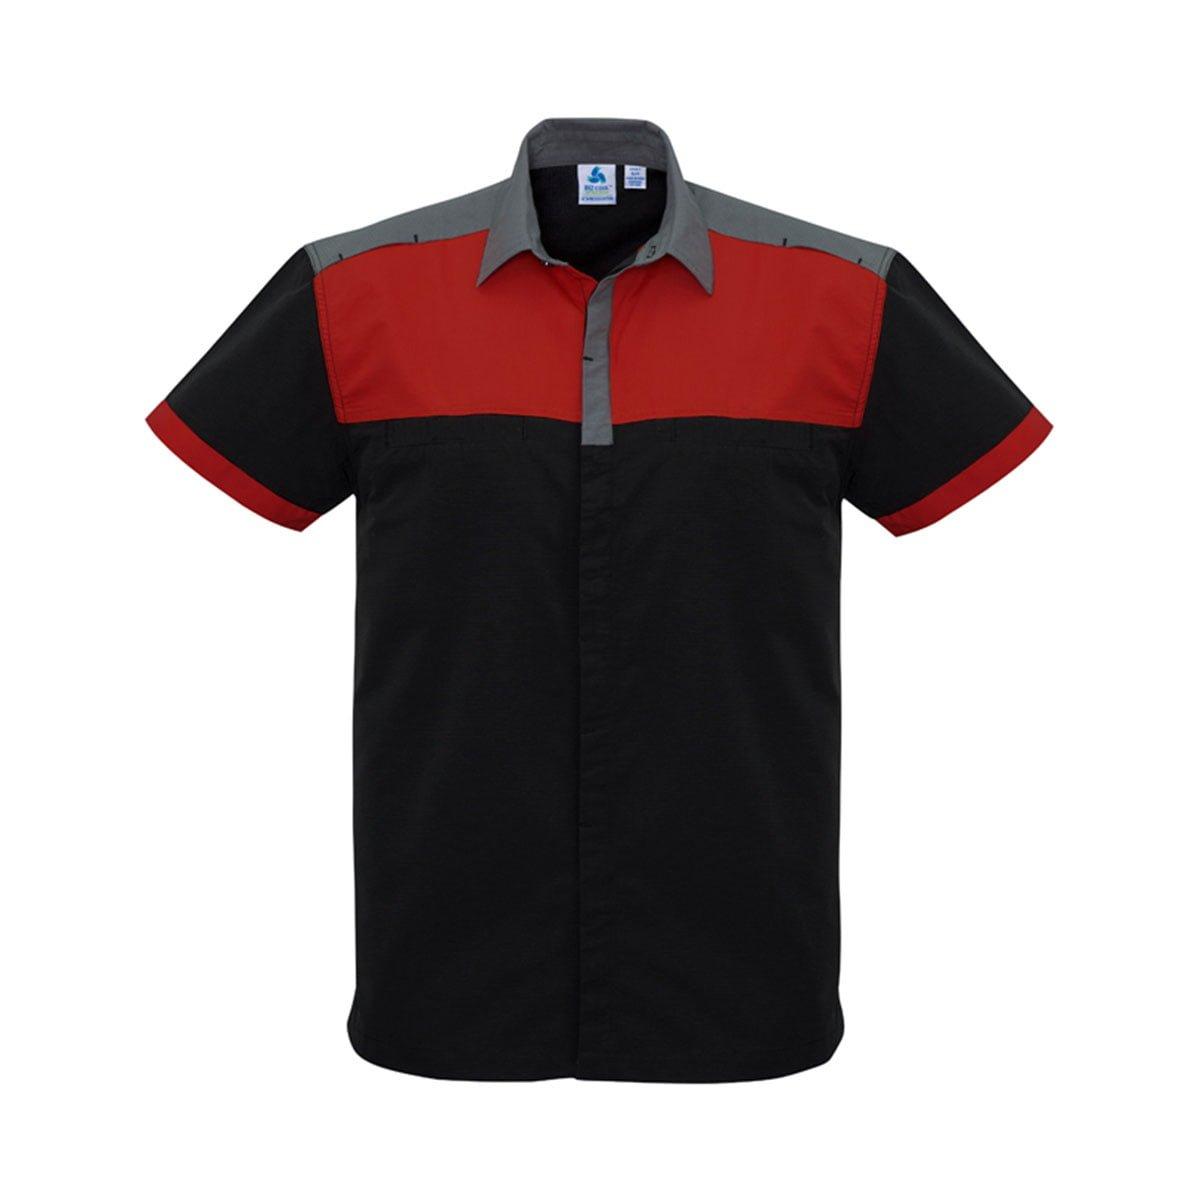 Mens Charger Shirt-Black / Red / Grey